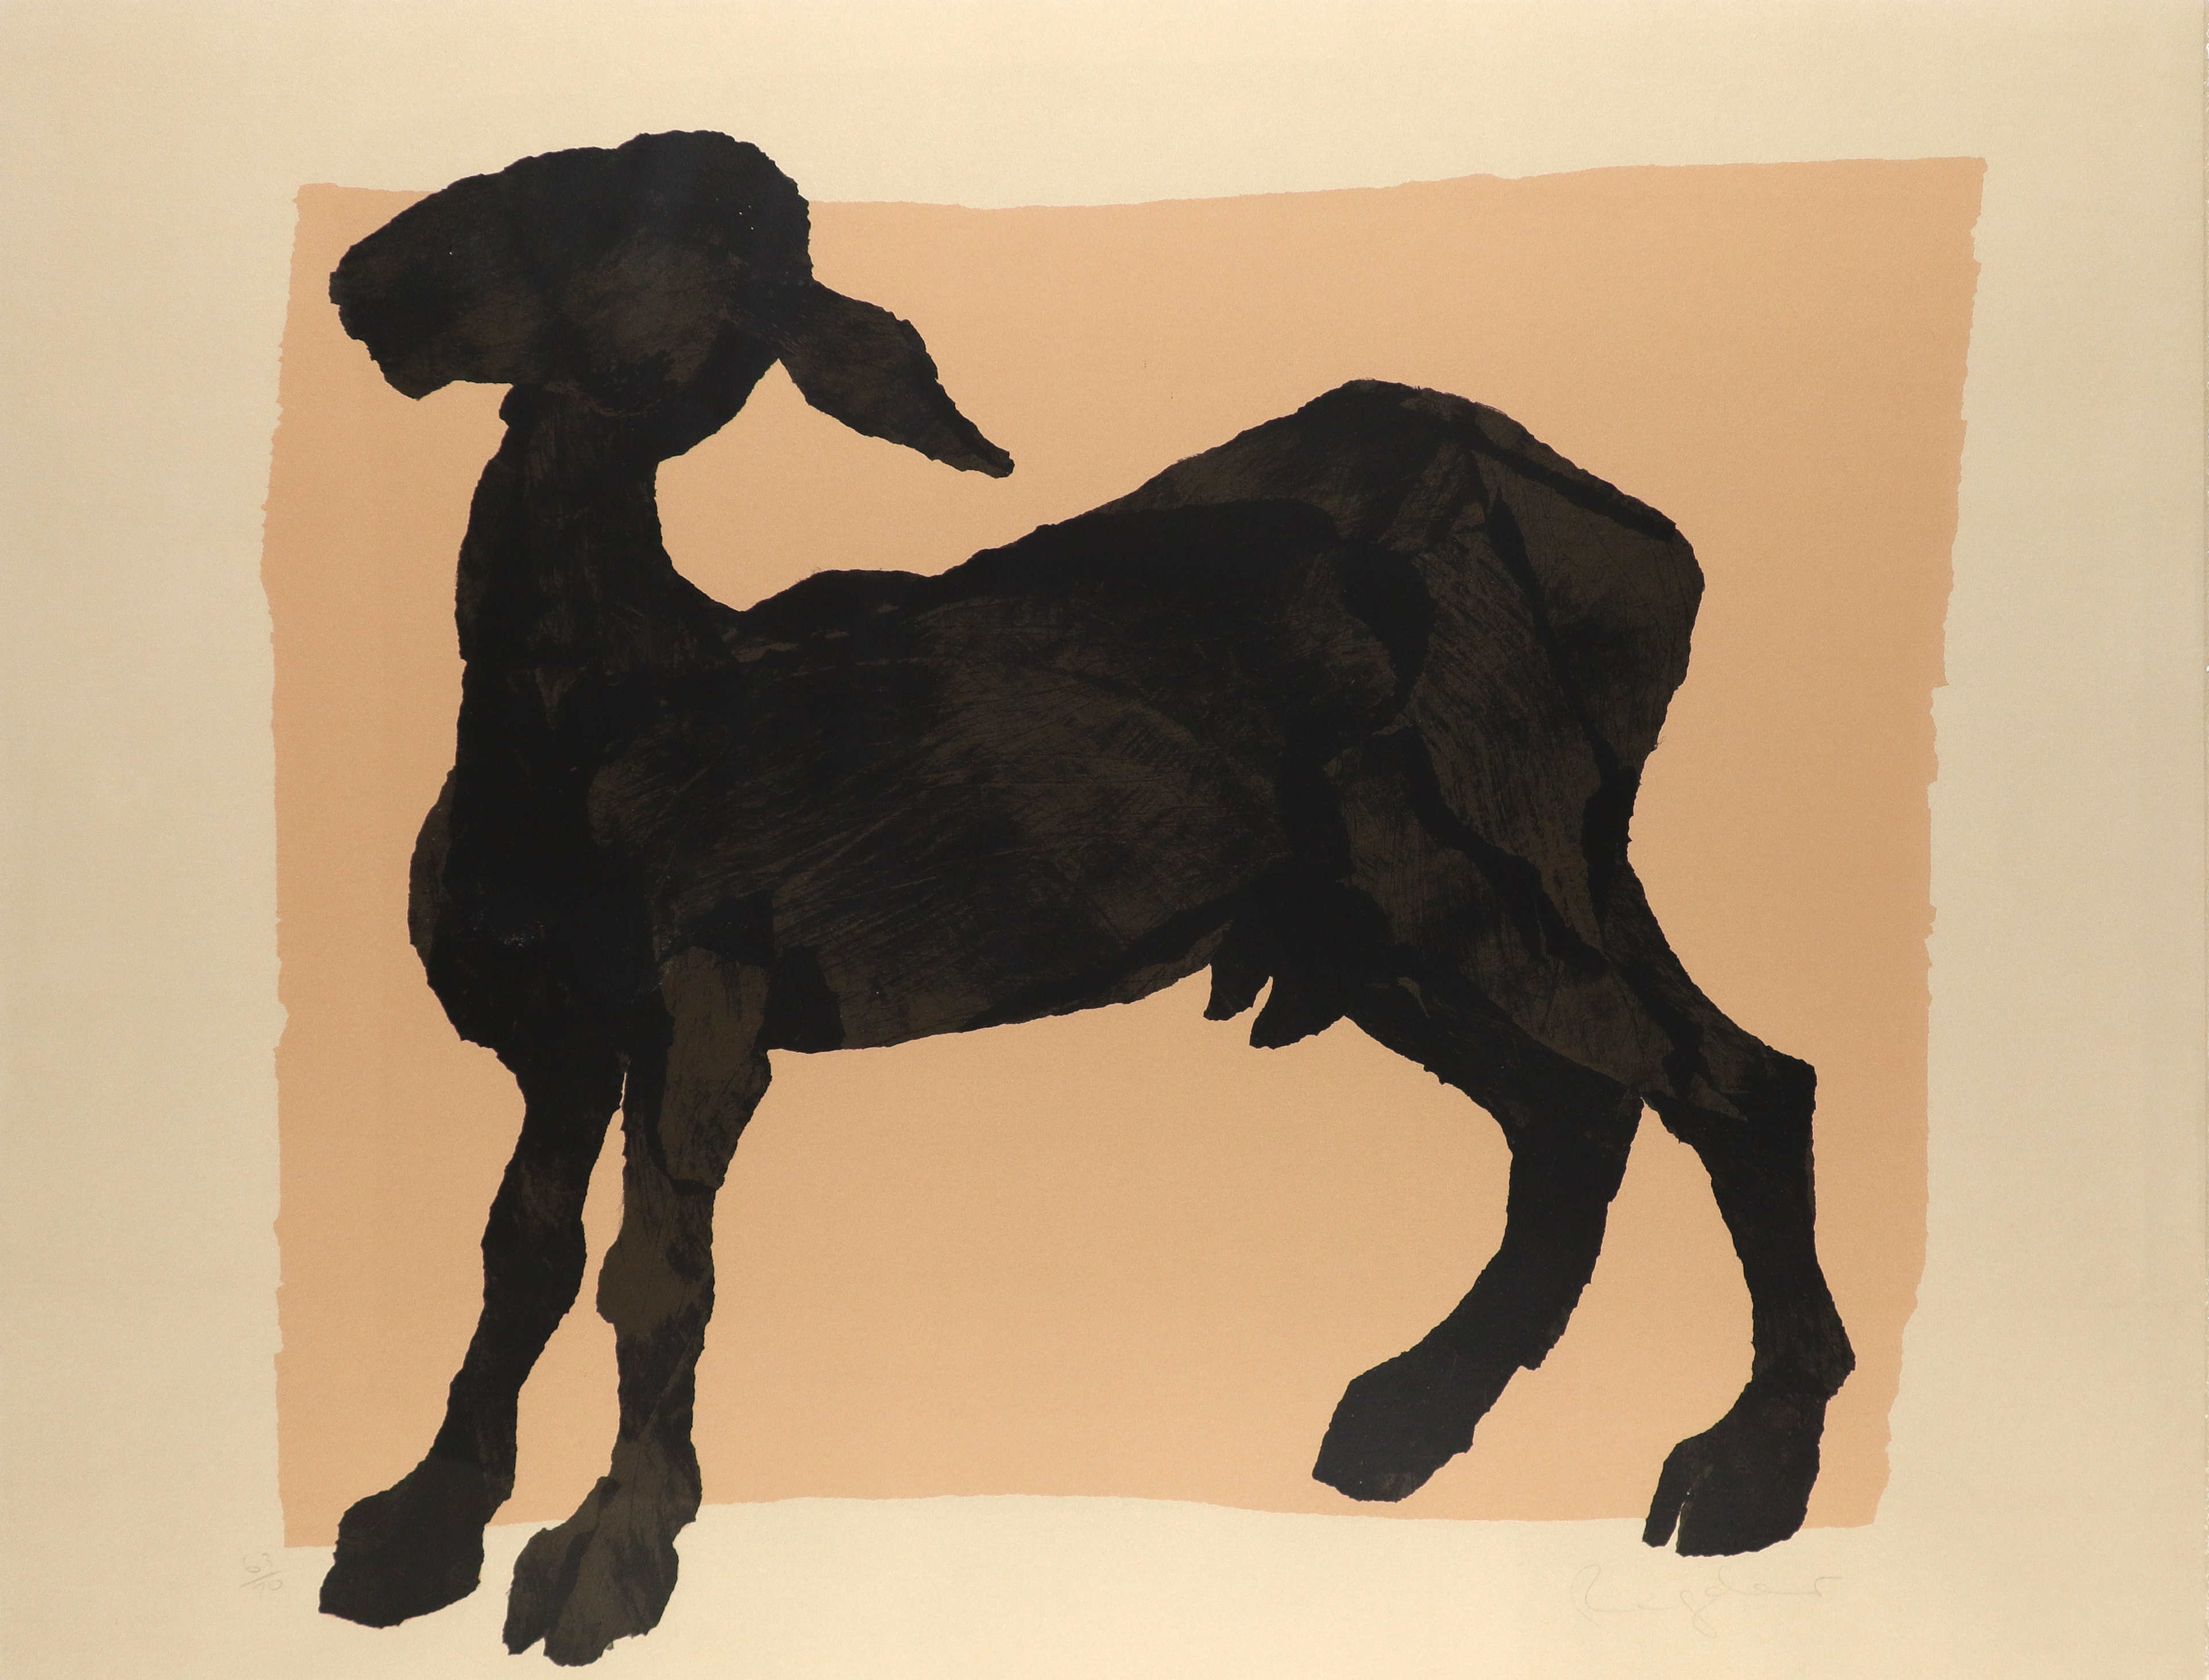 ‡Sophie Ryder (b.1963) Black goat Signed and numbered 63/70 Ryder (in pencil) Screenprint 79 x 103.